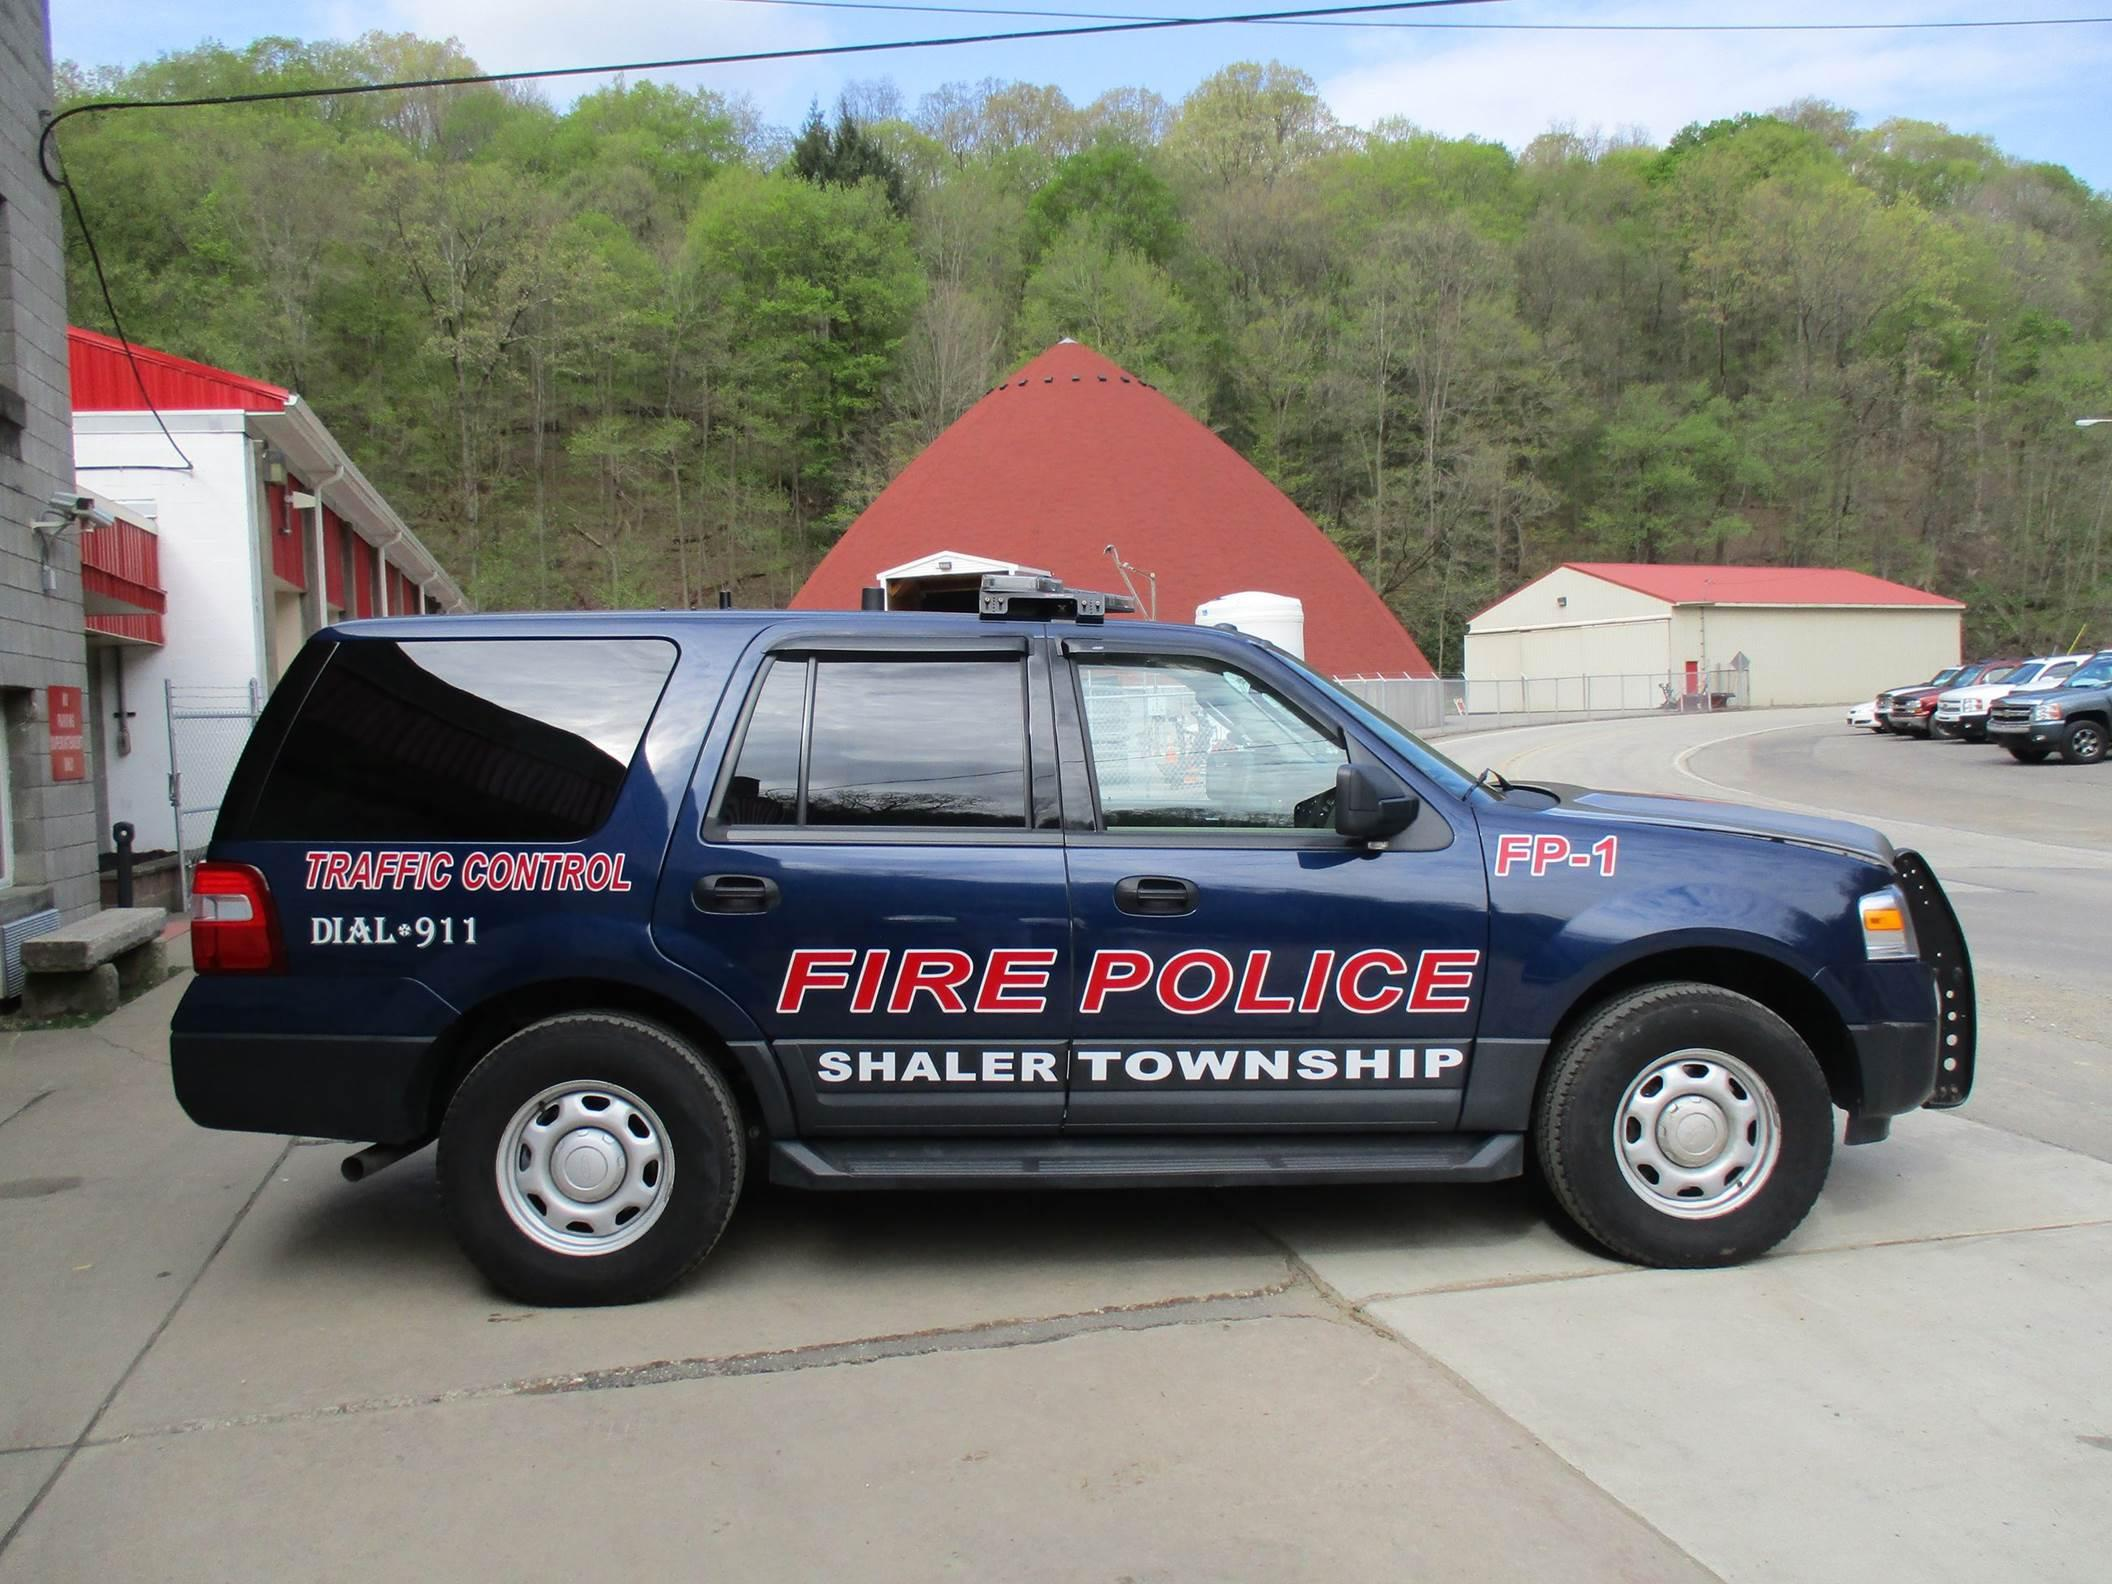 Shaler Township PA Fire Police FP-1